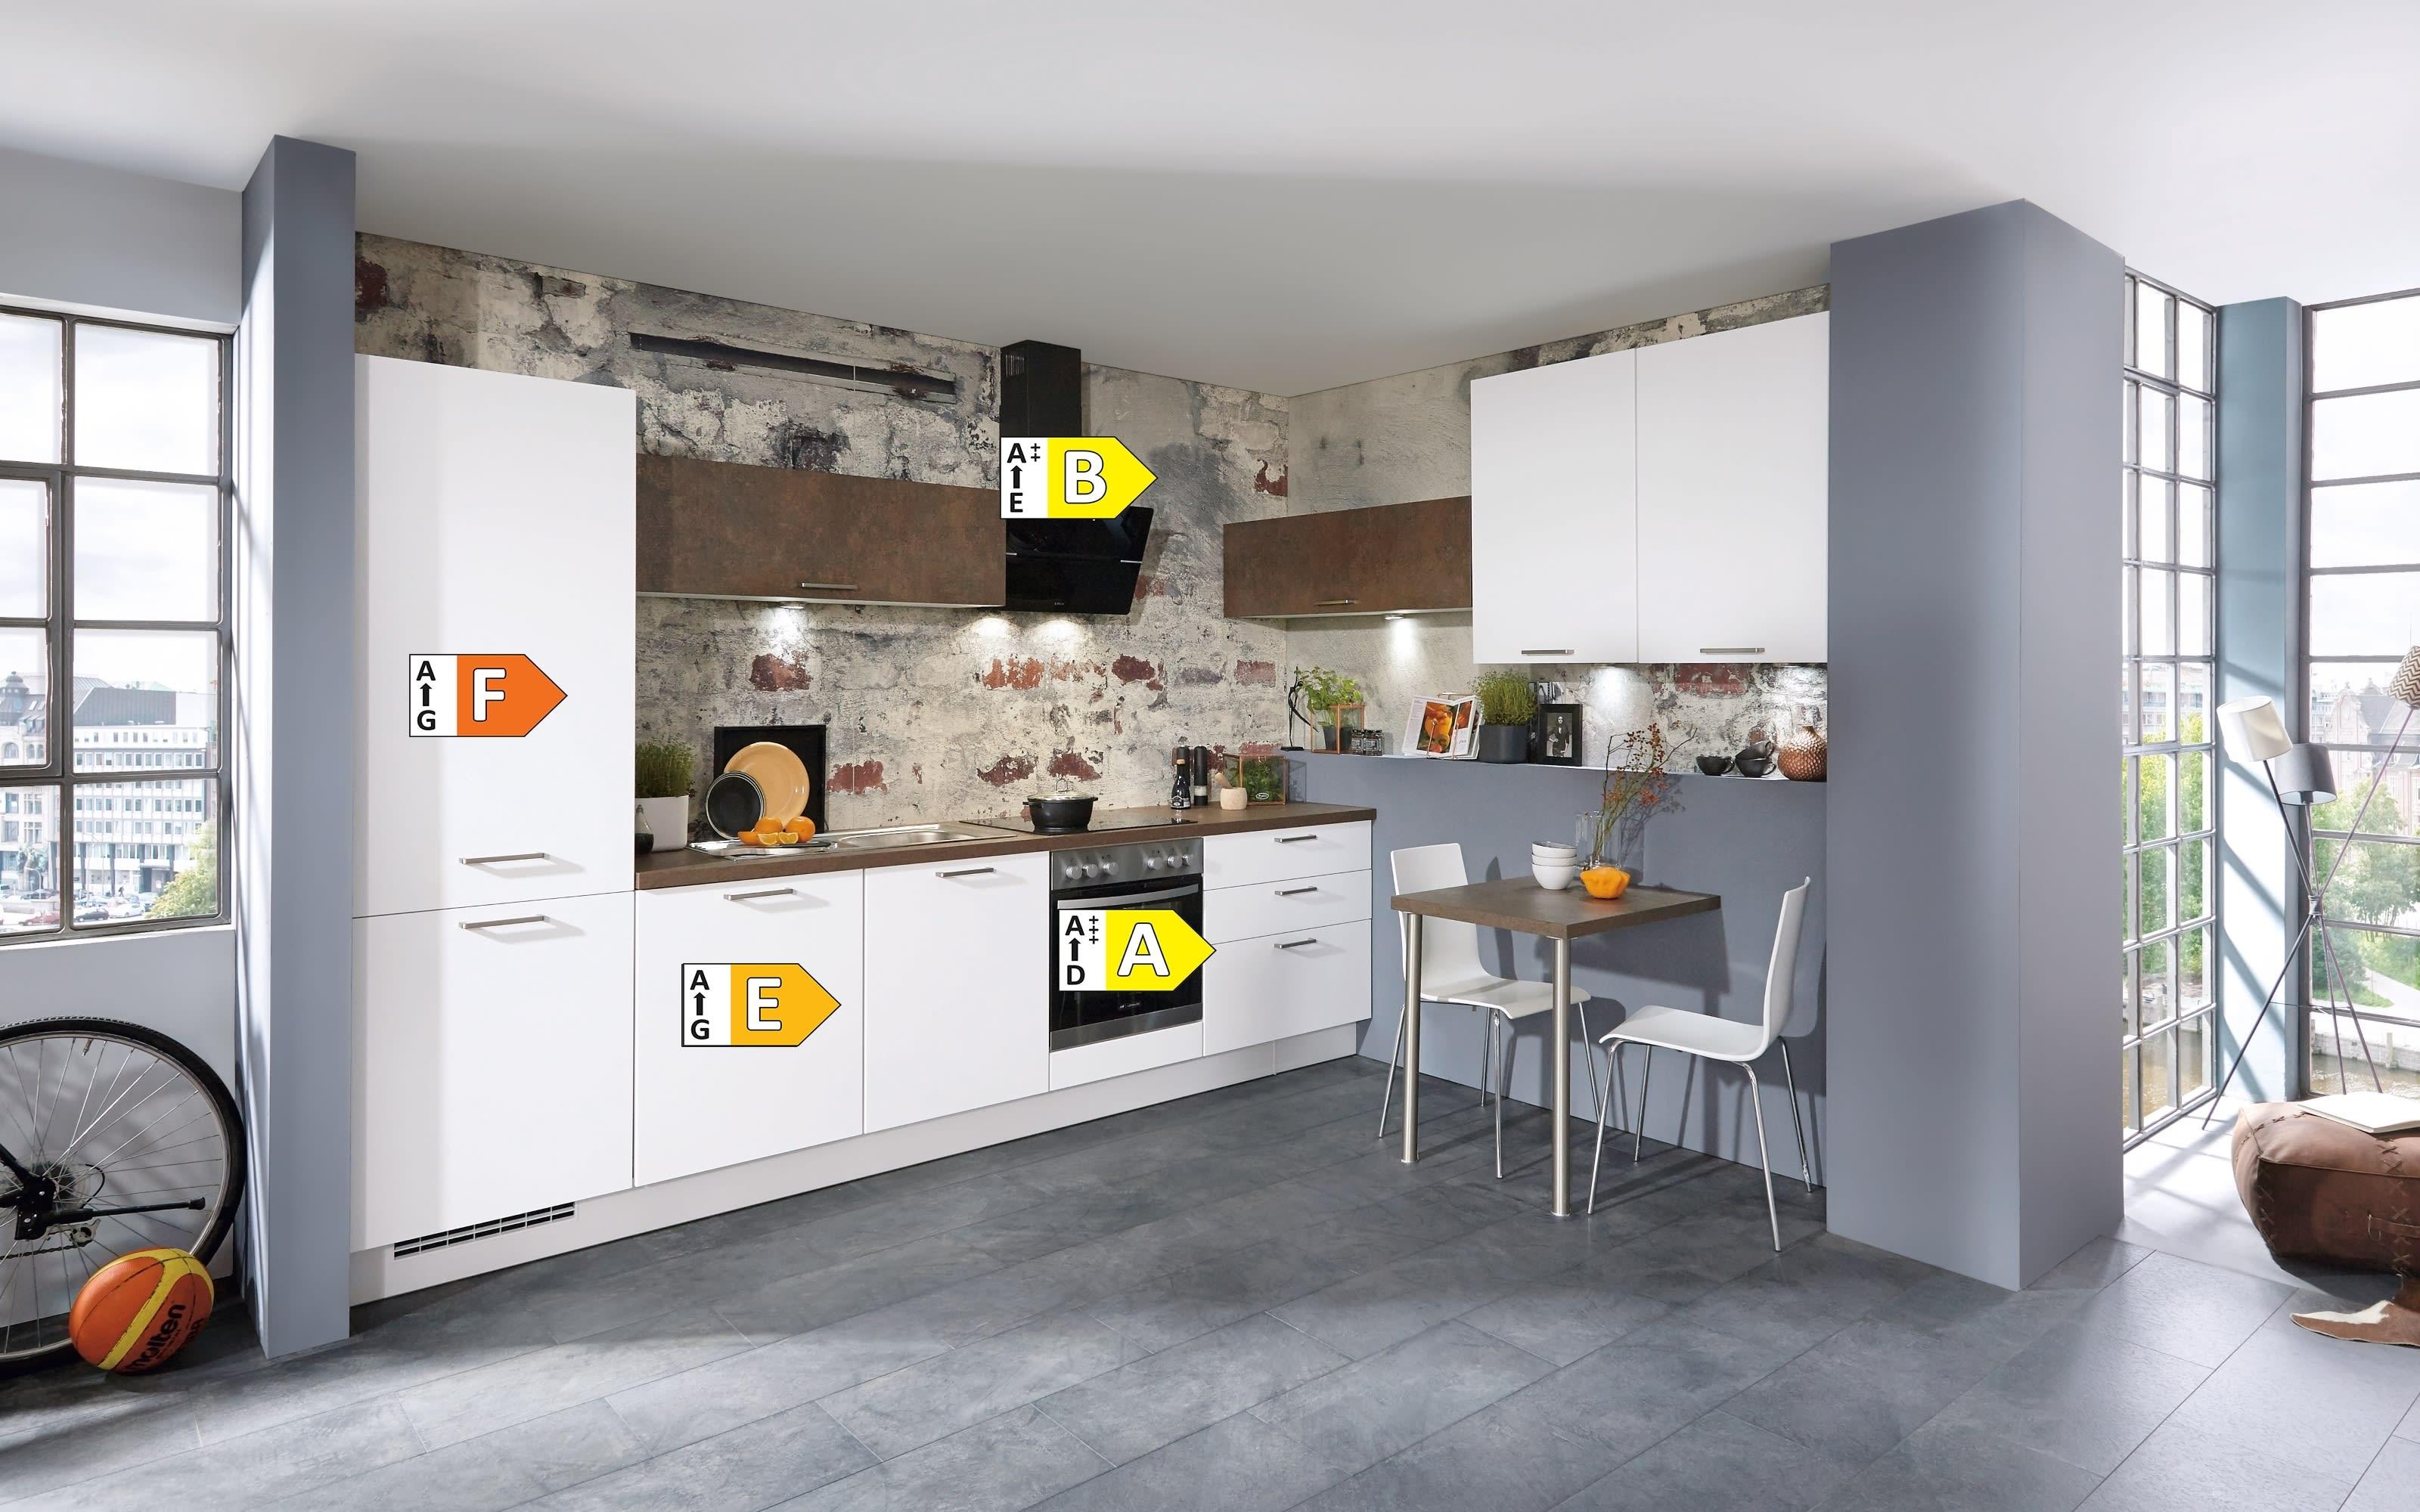 Einbauküche Touch, alpinweiß Lacklaminat supermatt, inklusive Elektrogeräte